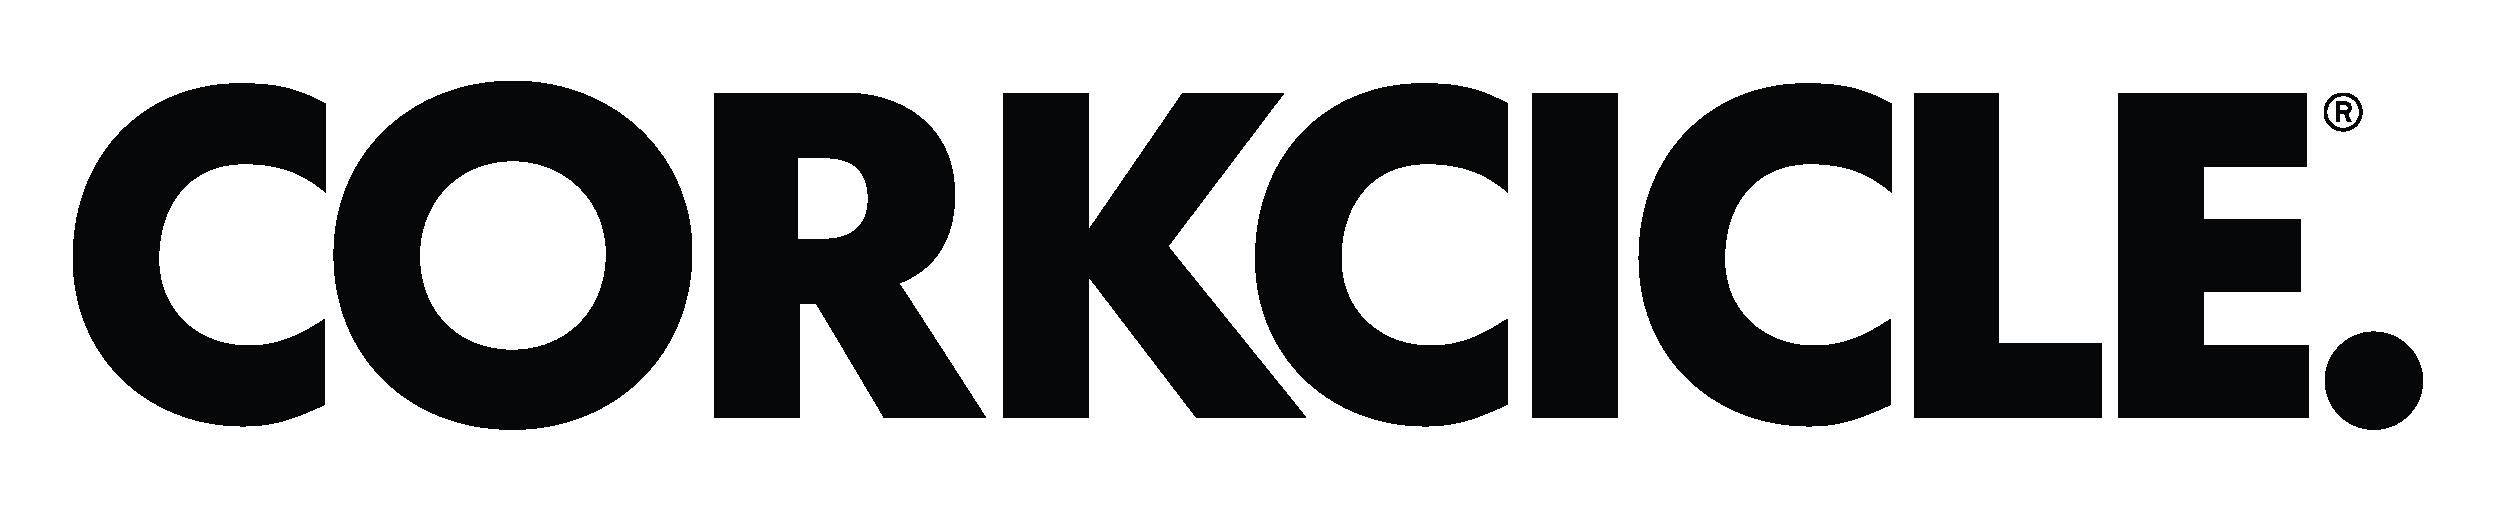 corkcicle-logo-main.png